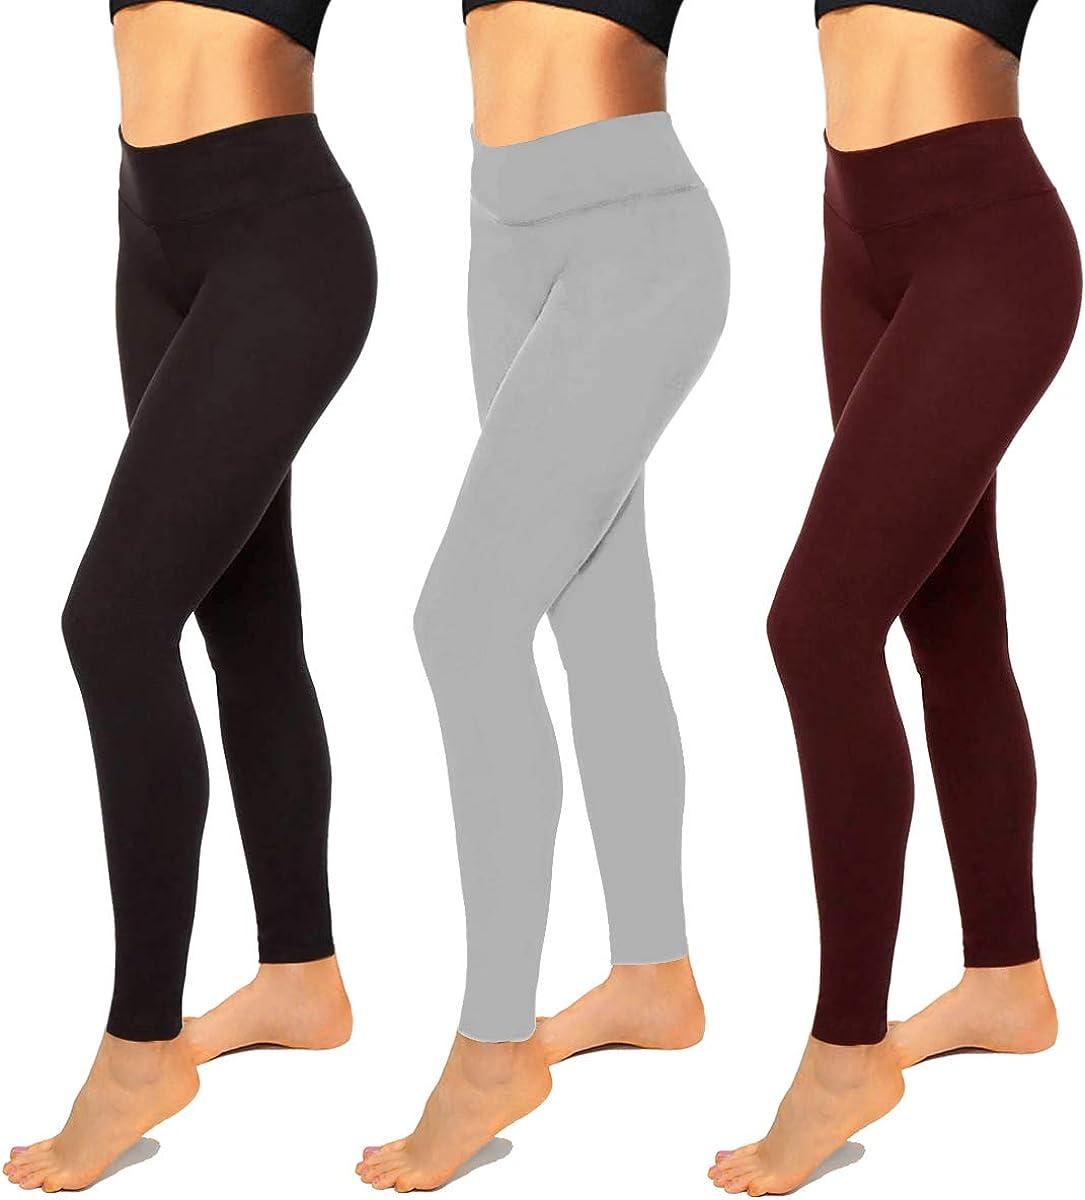 Premium Black Leggings for Women-High Waist Leggings Soft Athletic Tummy Control Pants for Running Cycling Yoga Workout